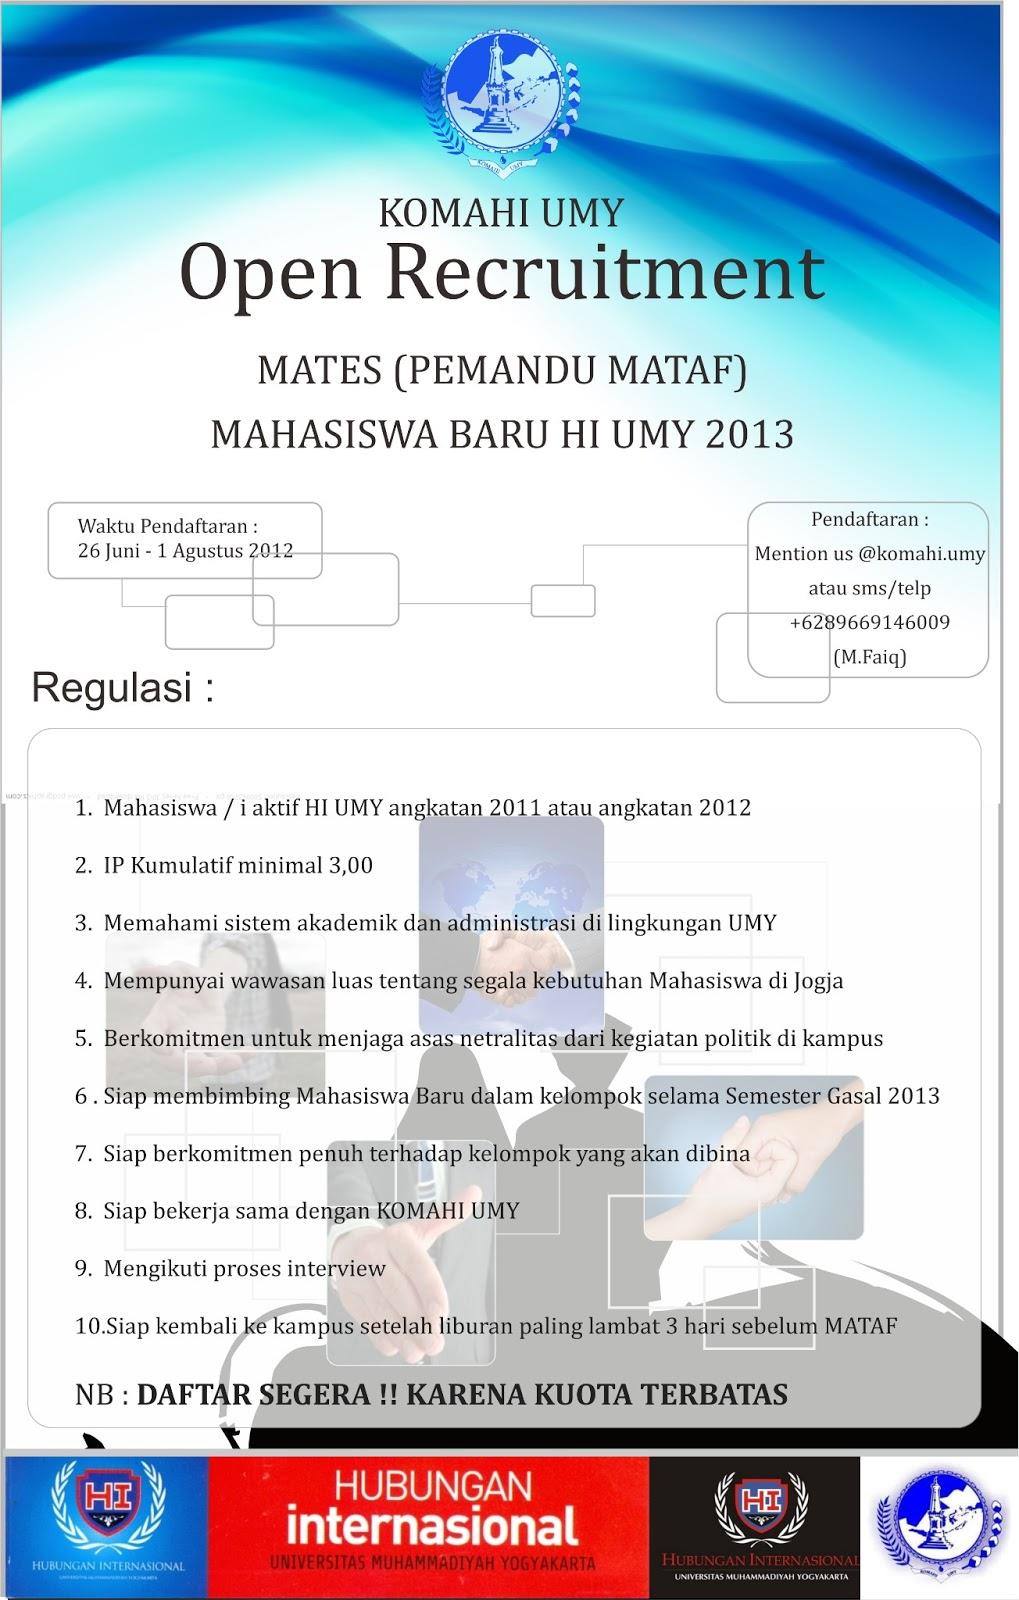 Open Recruitment Mates Pemandu Mataf Mahasiswa Baru Hi Umy 2013